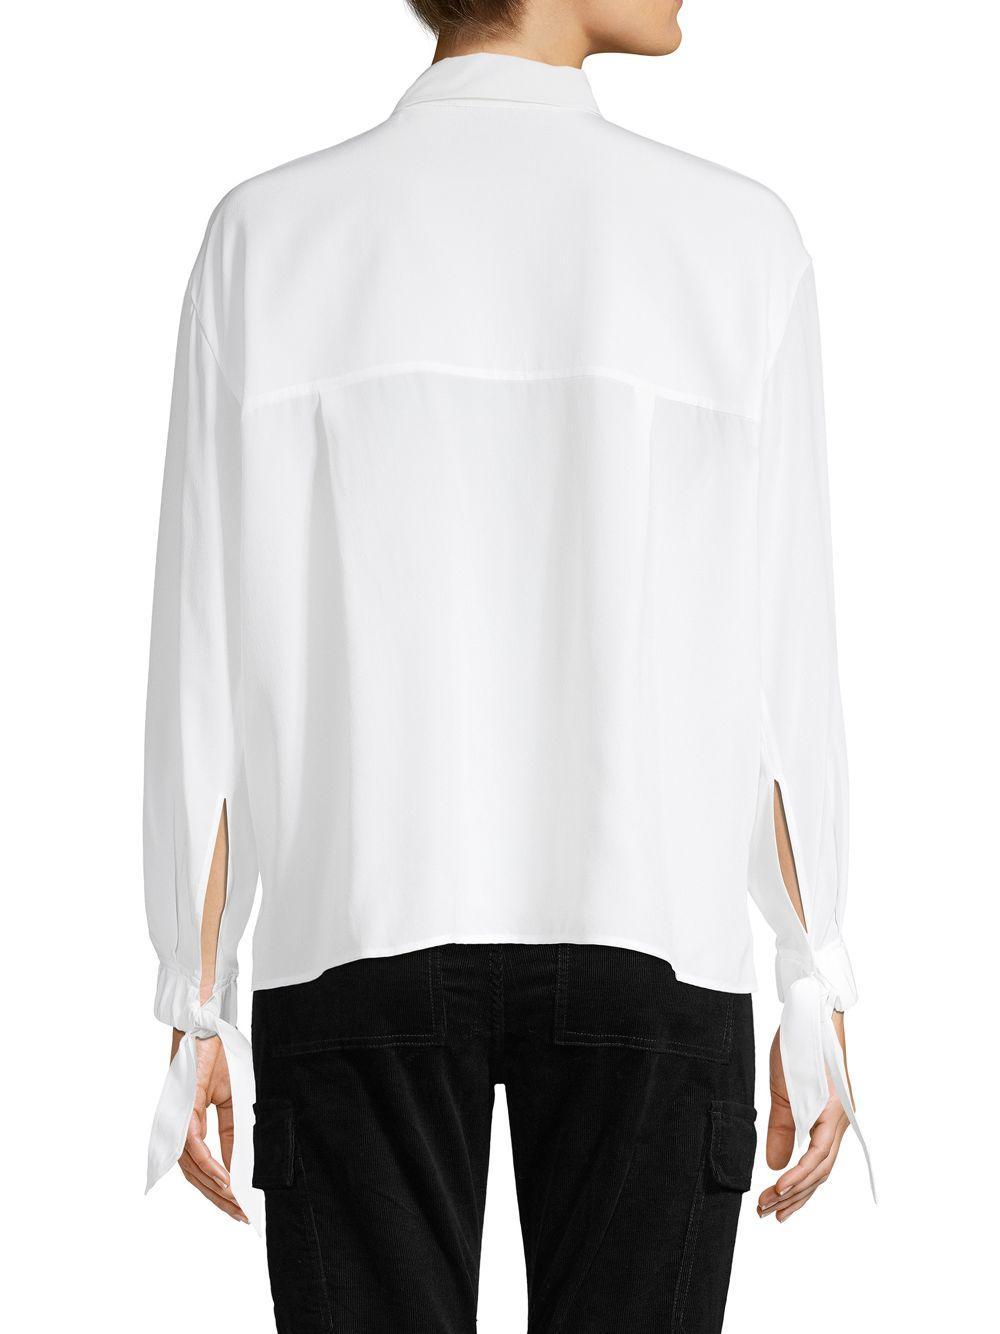 8029baa5c82e3 Lyst - Vince Silk Tie Sleeve Blouse in White